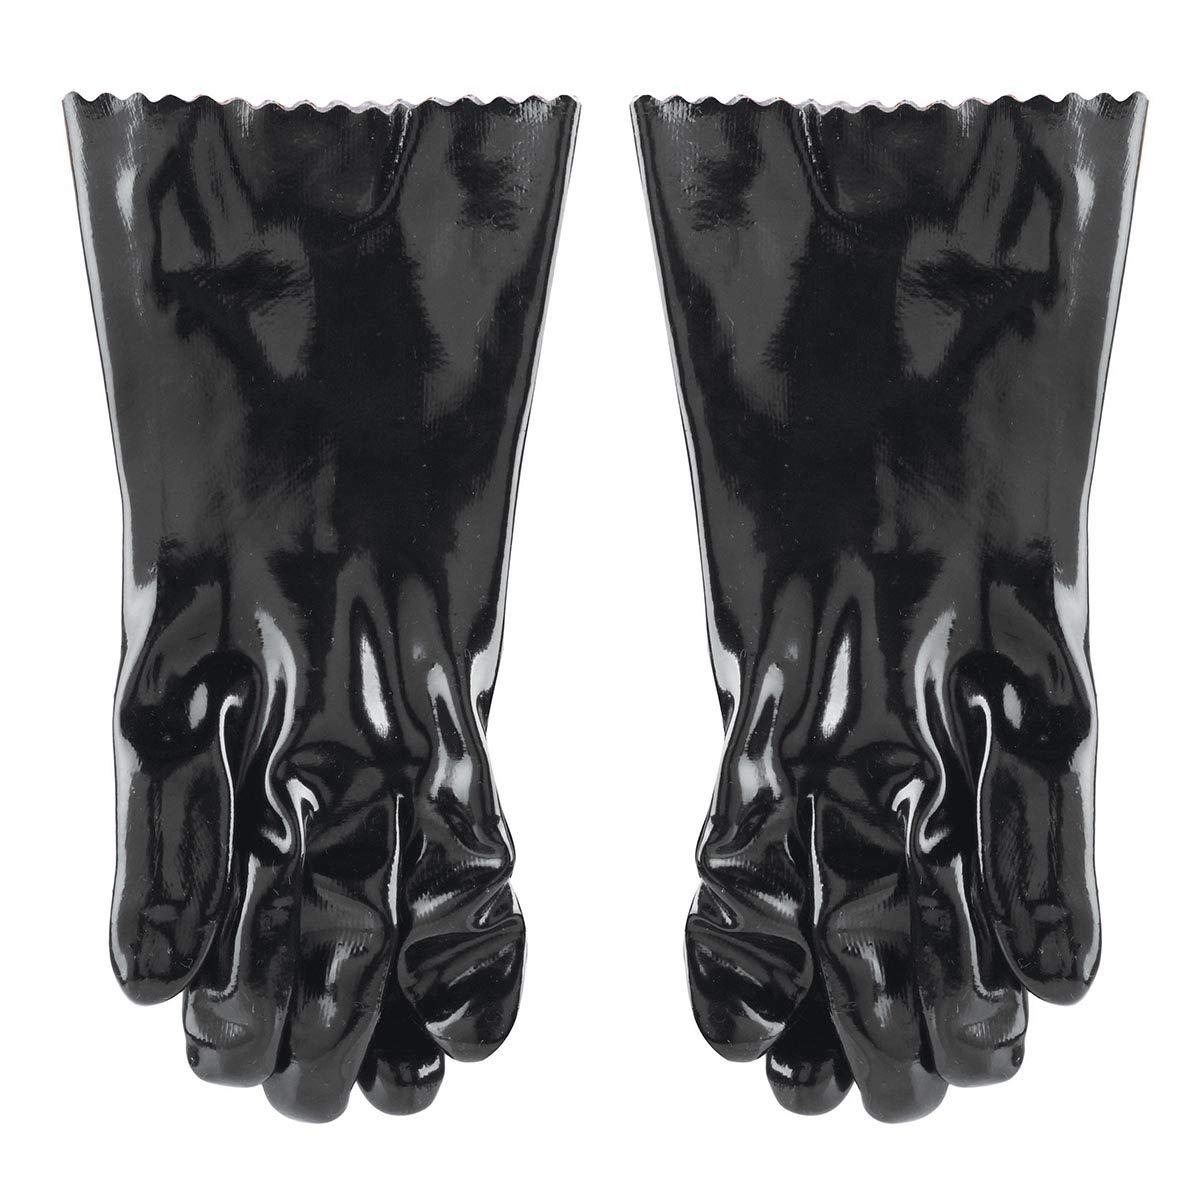 Amazon.com: MR. Bar-B-Q Insulated barbacoa guantes: Jardín y ...